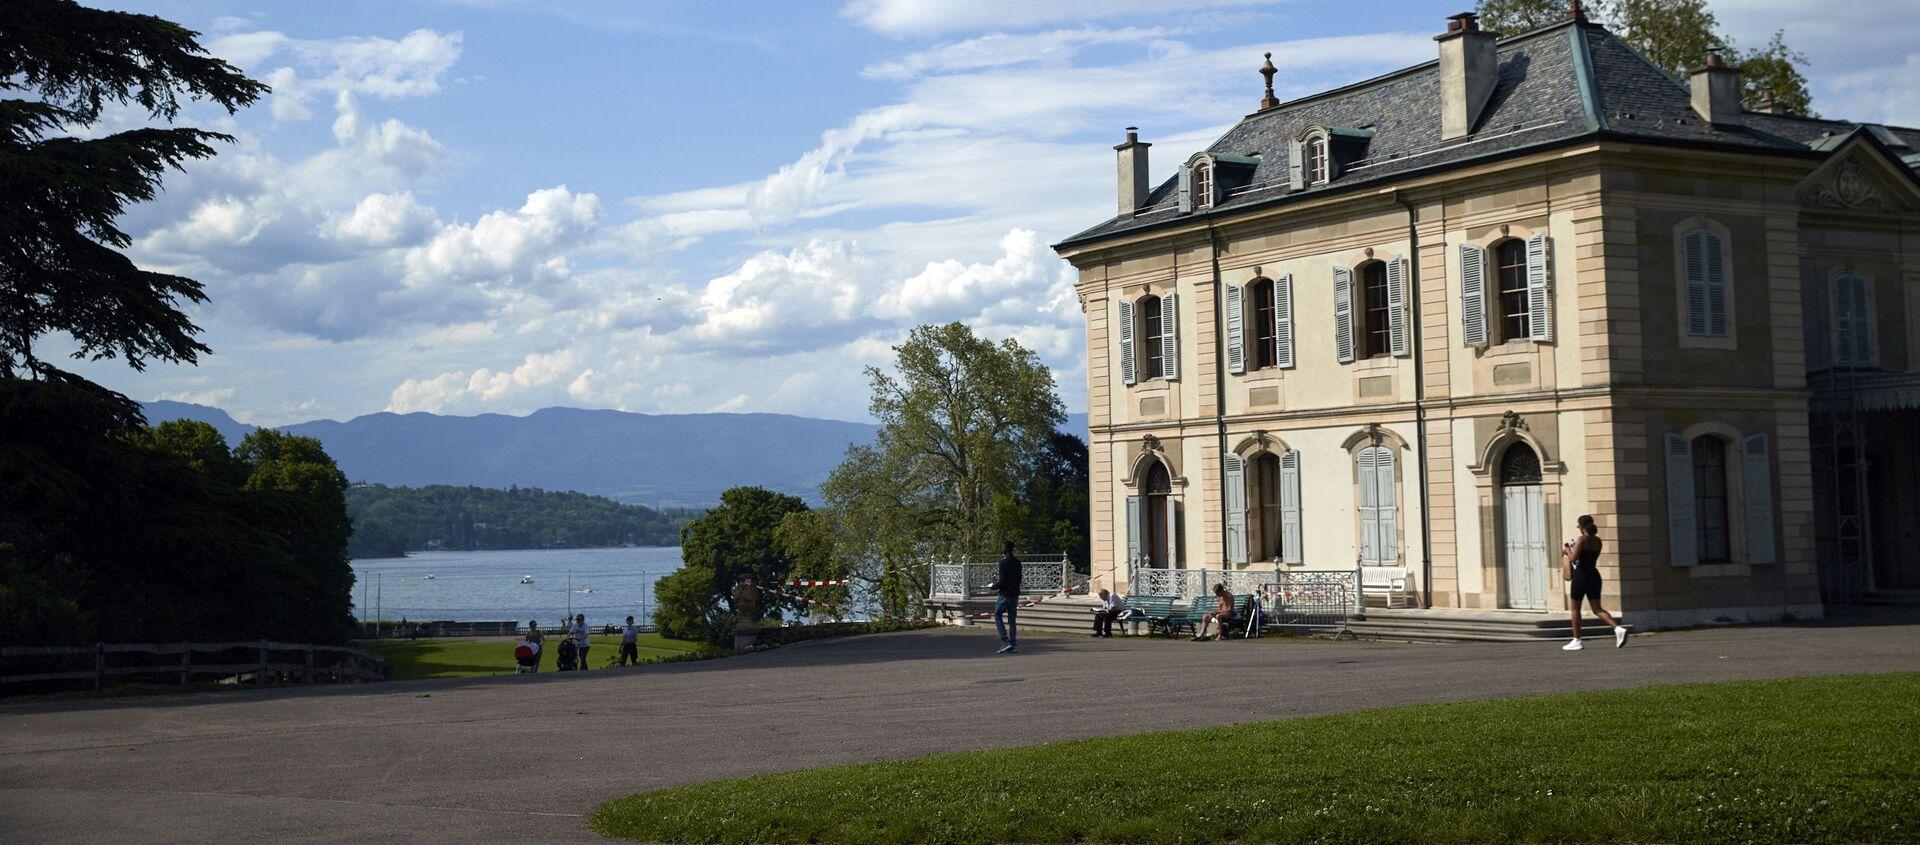 Villa La Grange ở Geneva. - Sputnik Việt Nam, 1920, 11.06.2021